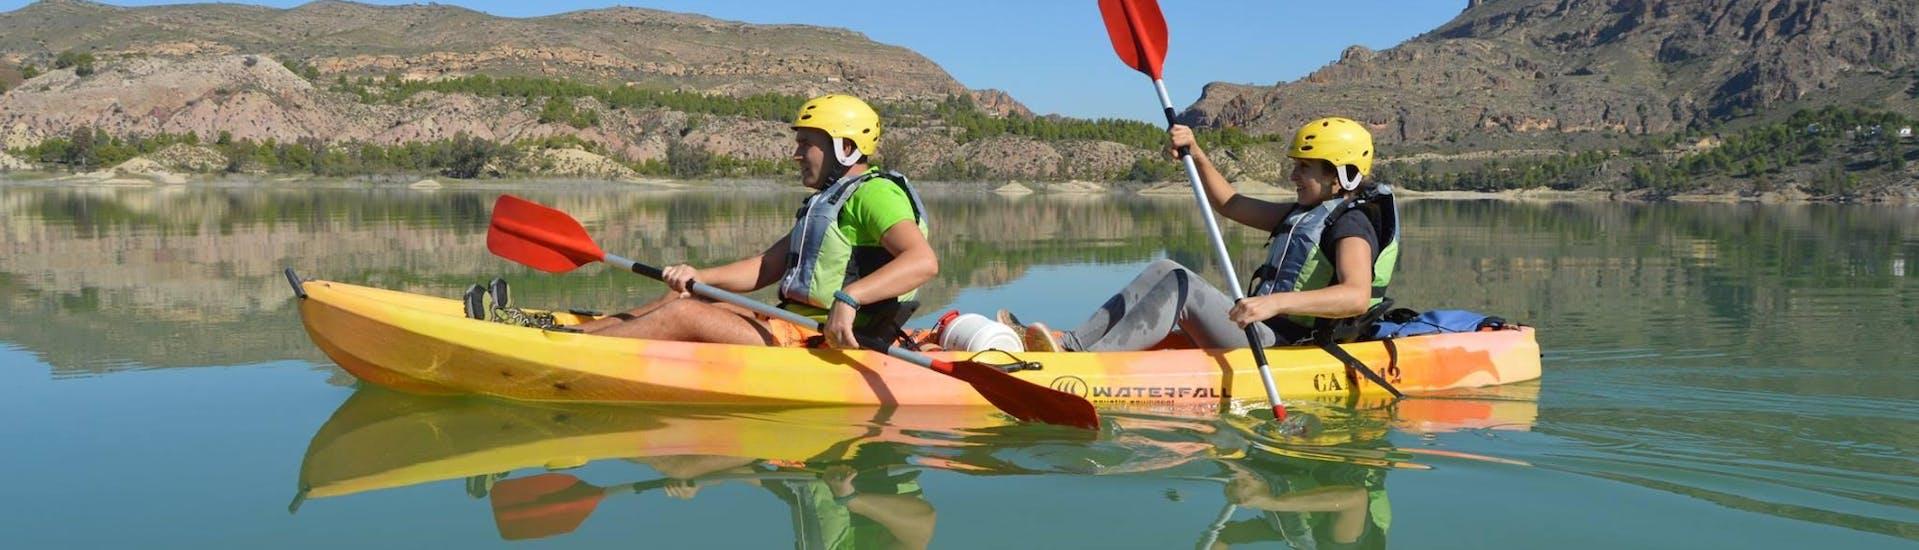 Two friends paddle in a kayak to Cañón de Almadenes on the Rio Segura with Cañón y Cañón Multiaventura.